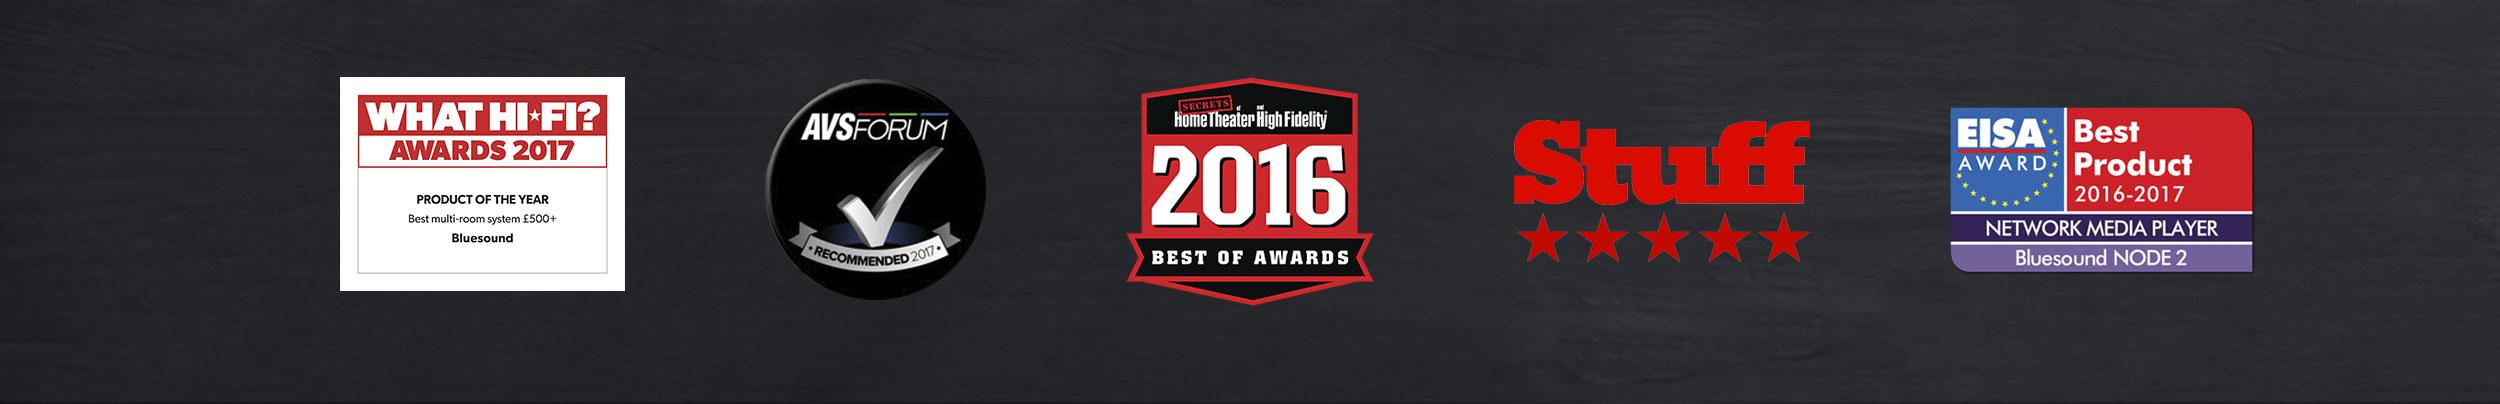 Logos of various awards won by Bluesound